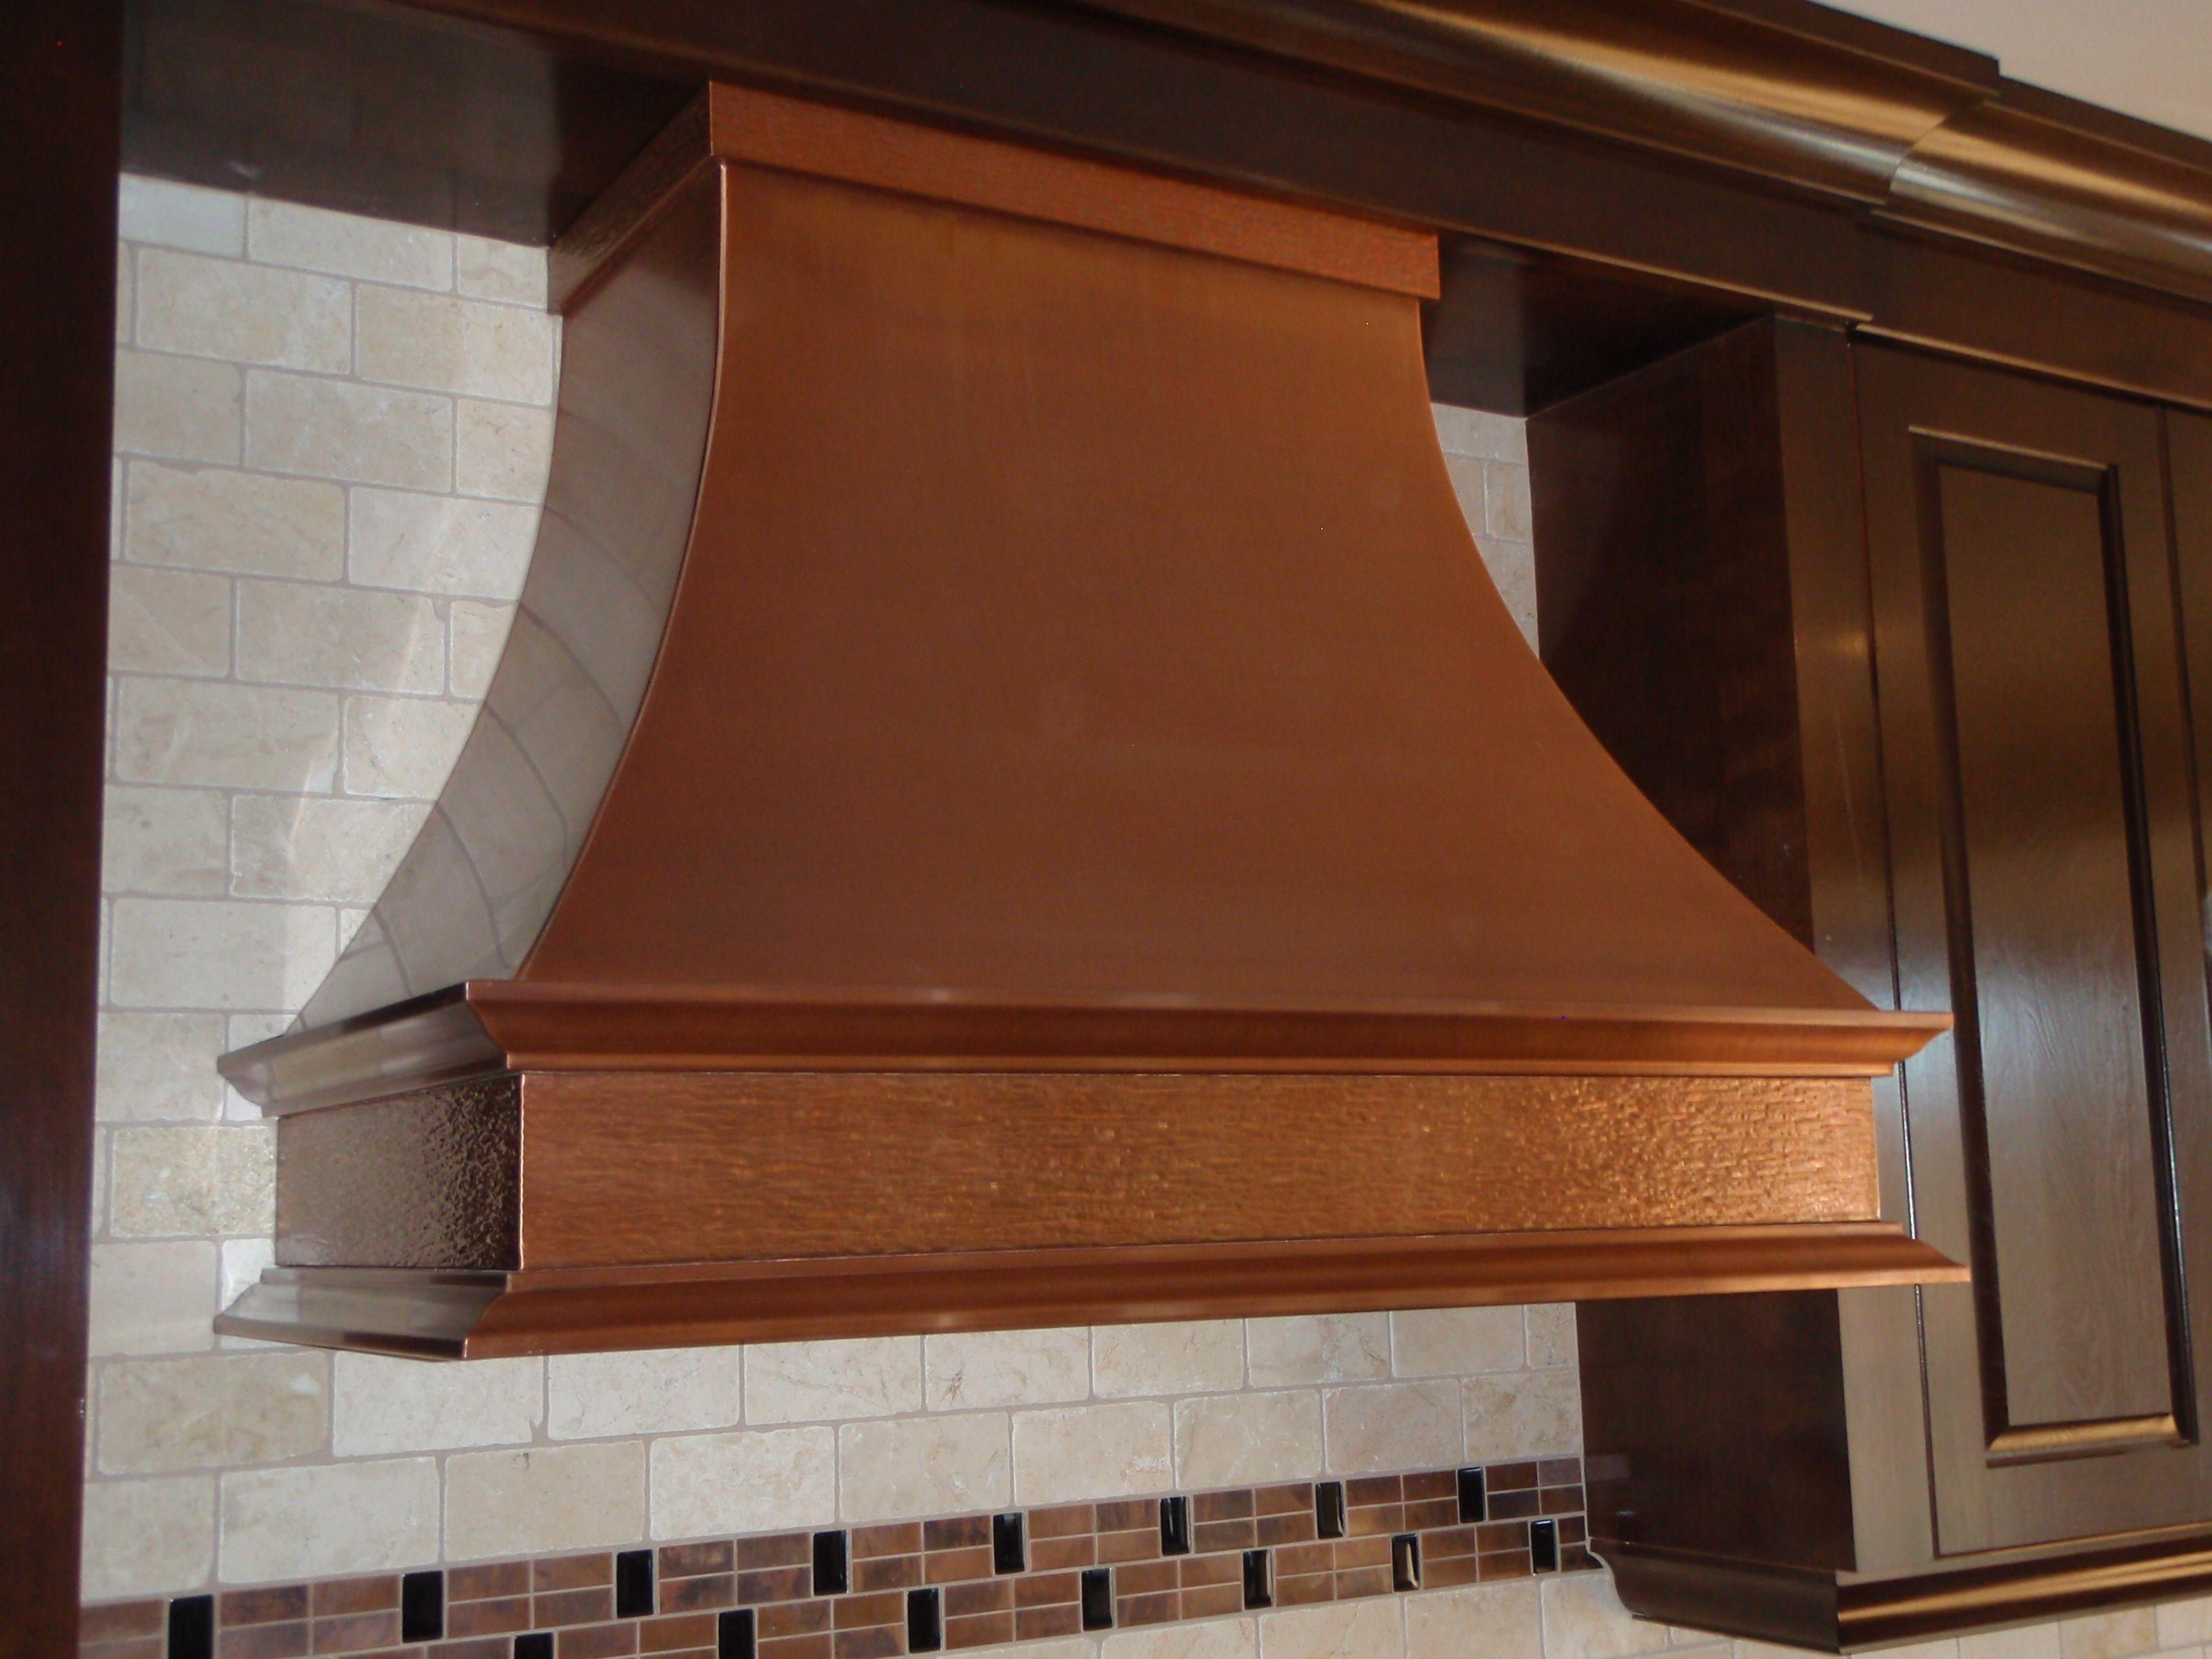 Copper P28 - Custom Copper Range Hood - Hoods by Hammersmith